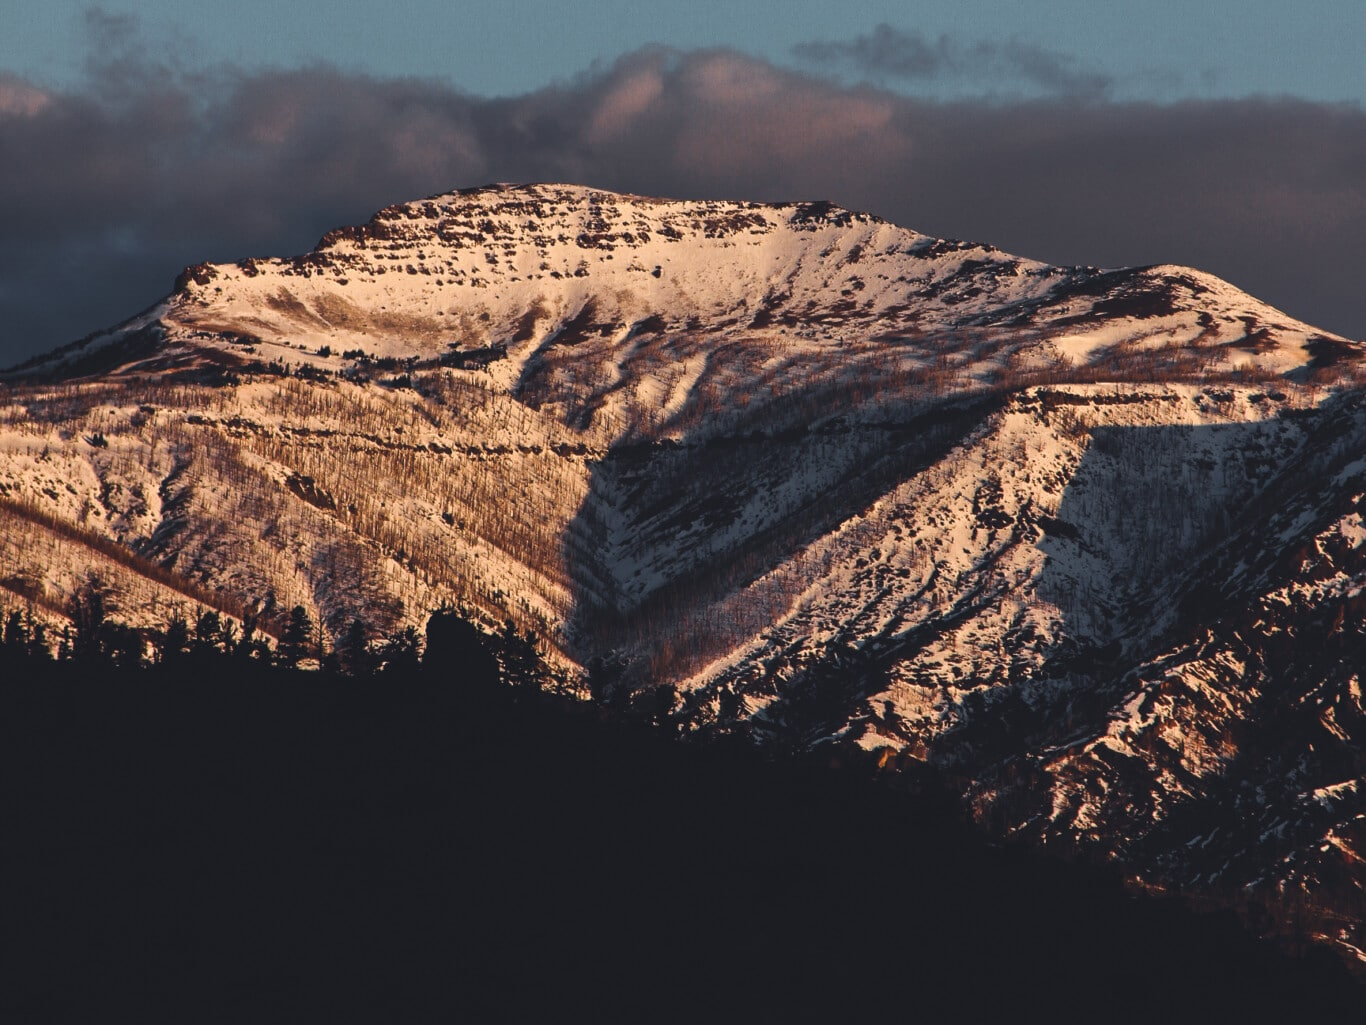 12142020_Mountain_North_Fork_Shoshone_River